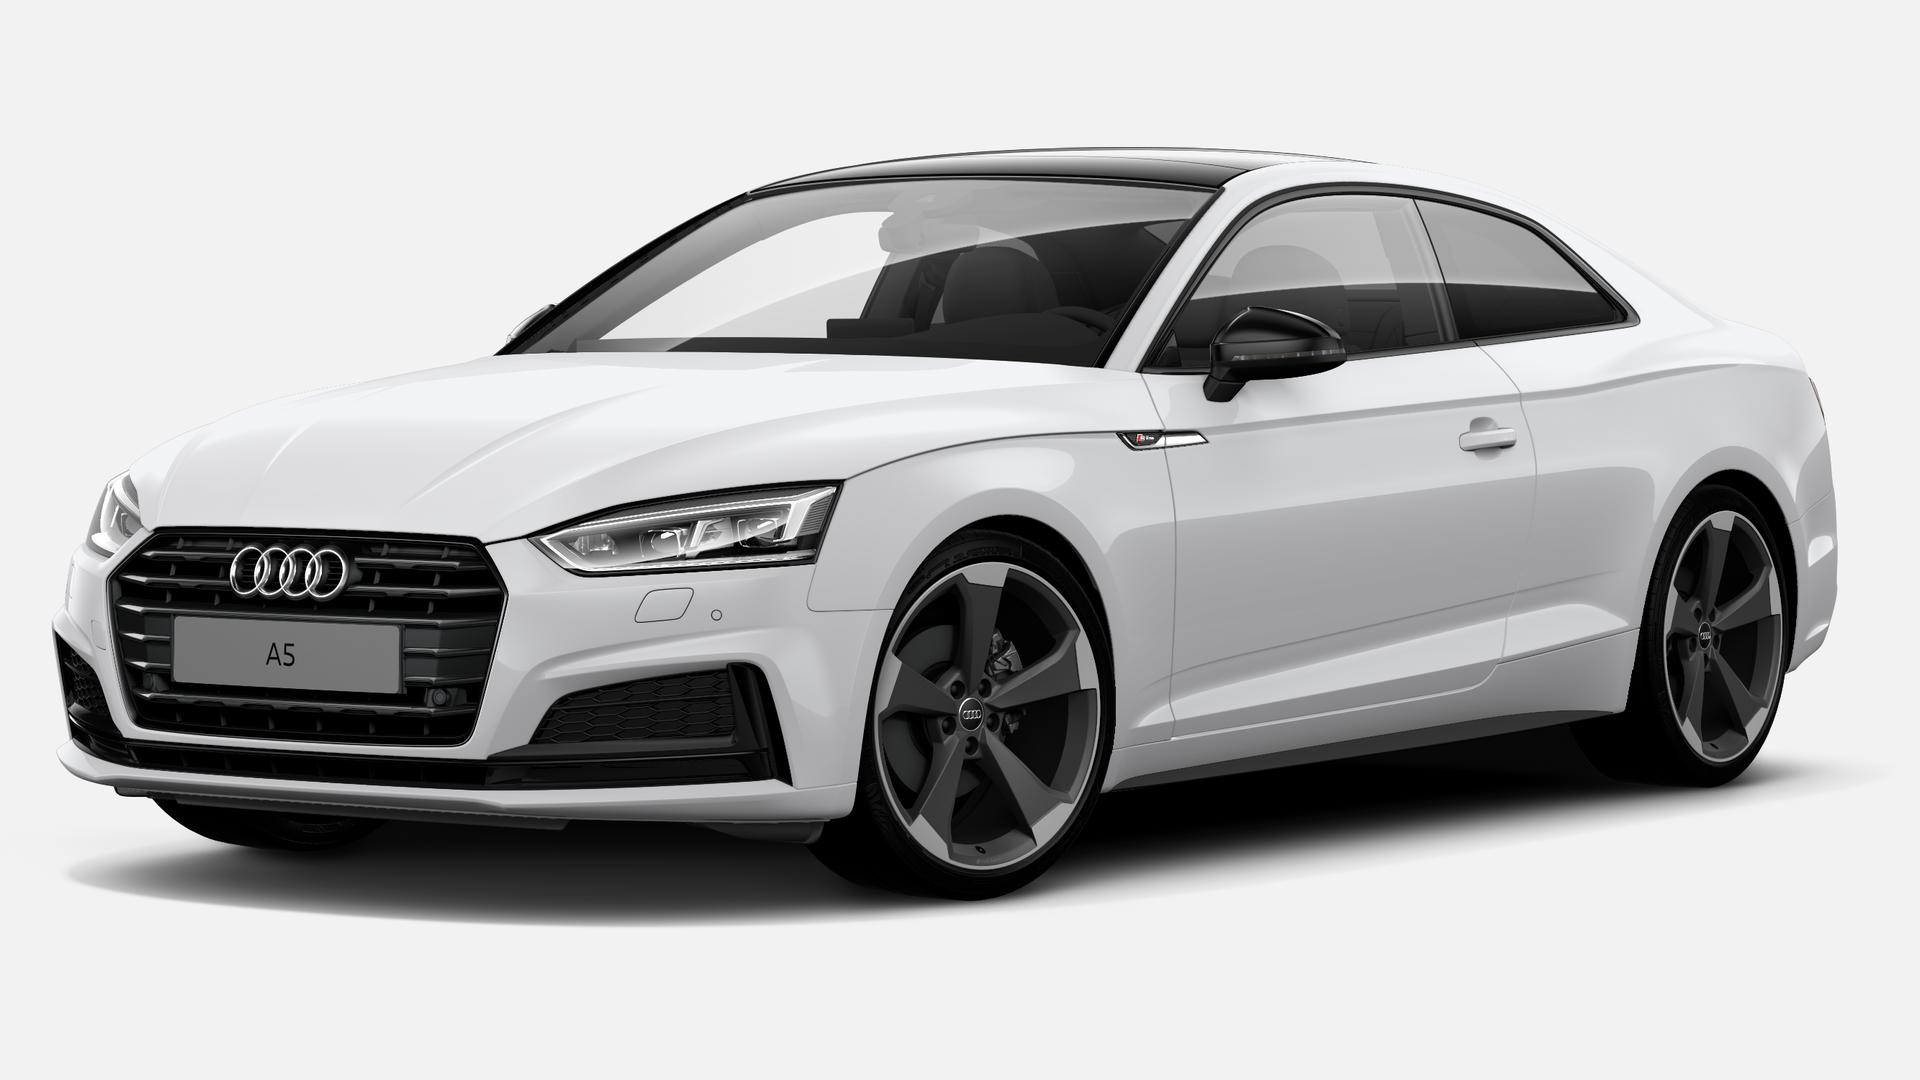 Audi A5 Coupe 40 TFSI S line S tronic 140 kW (190 CV)